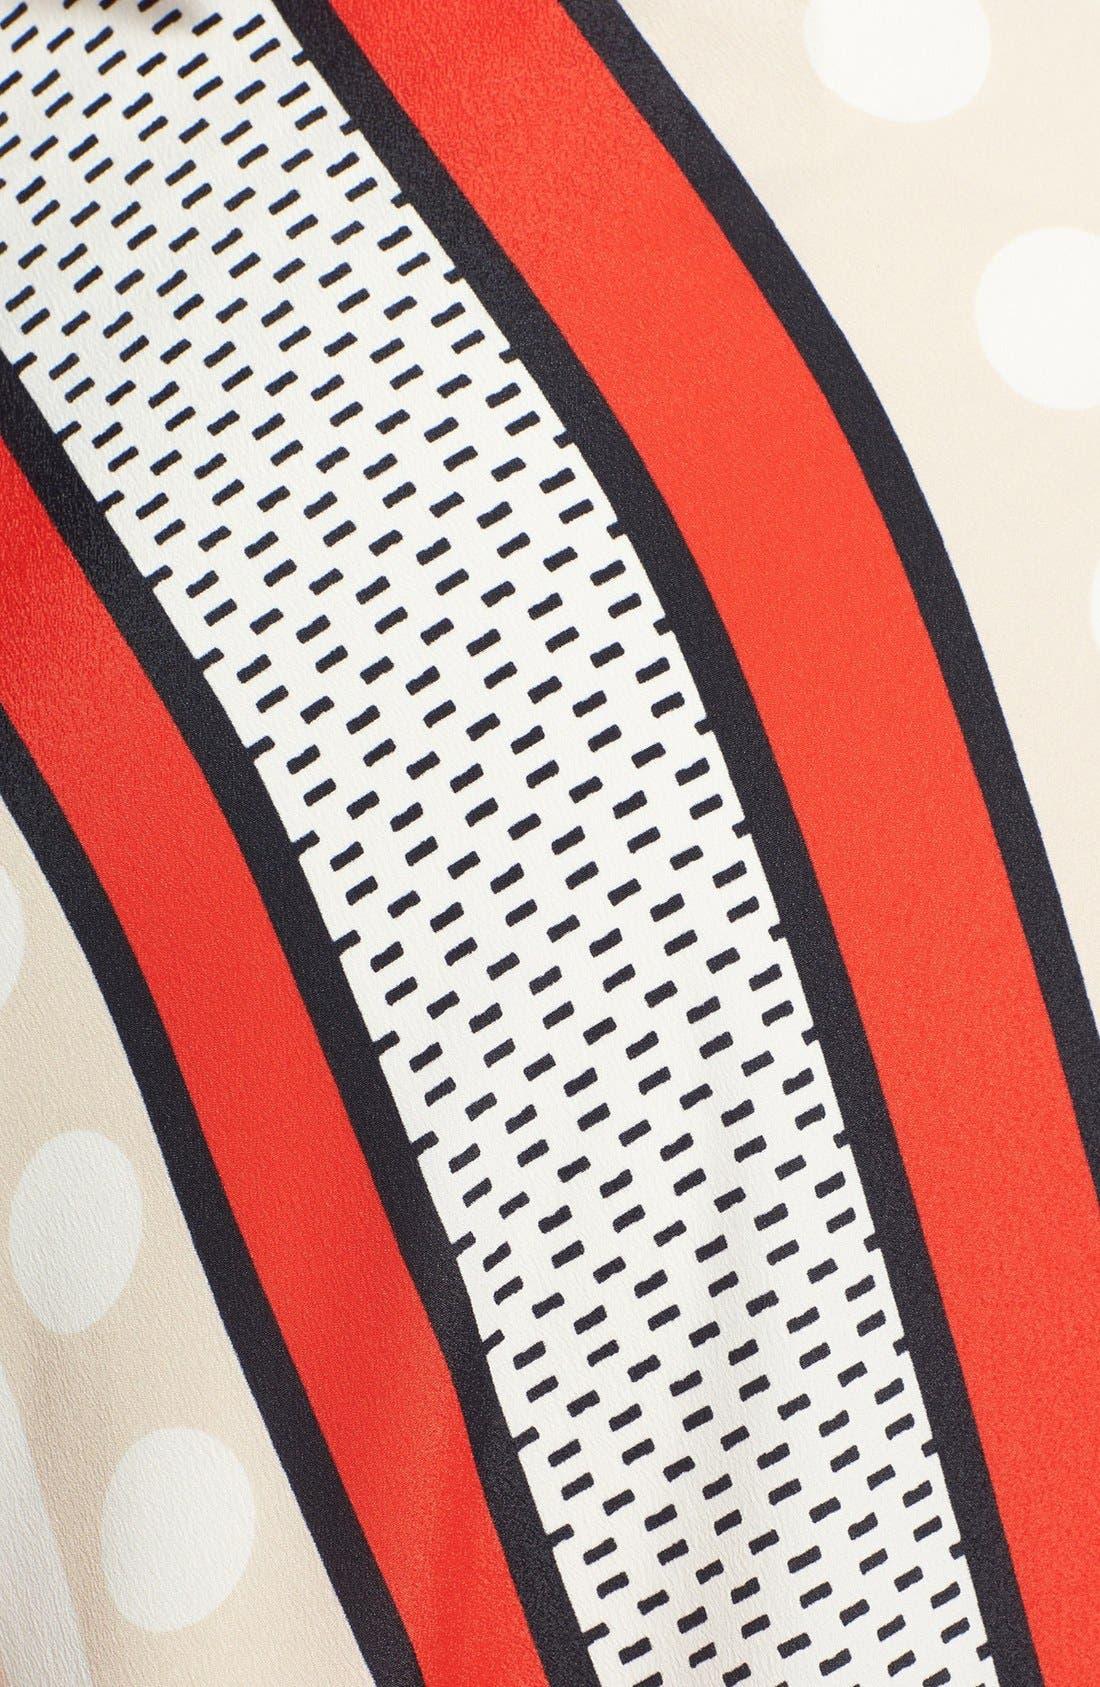 Scarf Print Woven Maxi Dress,                             Alternate thumbnail 10, color,                             PRINT